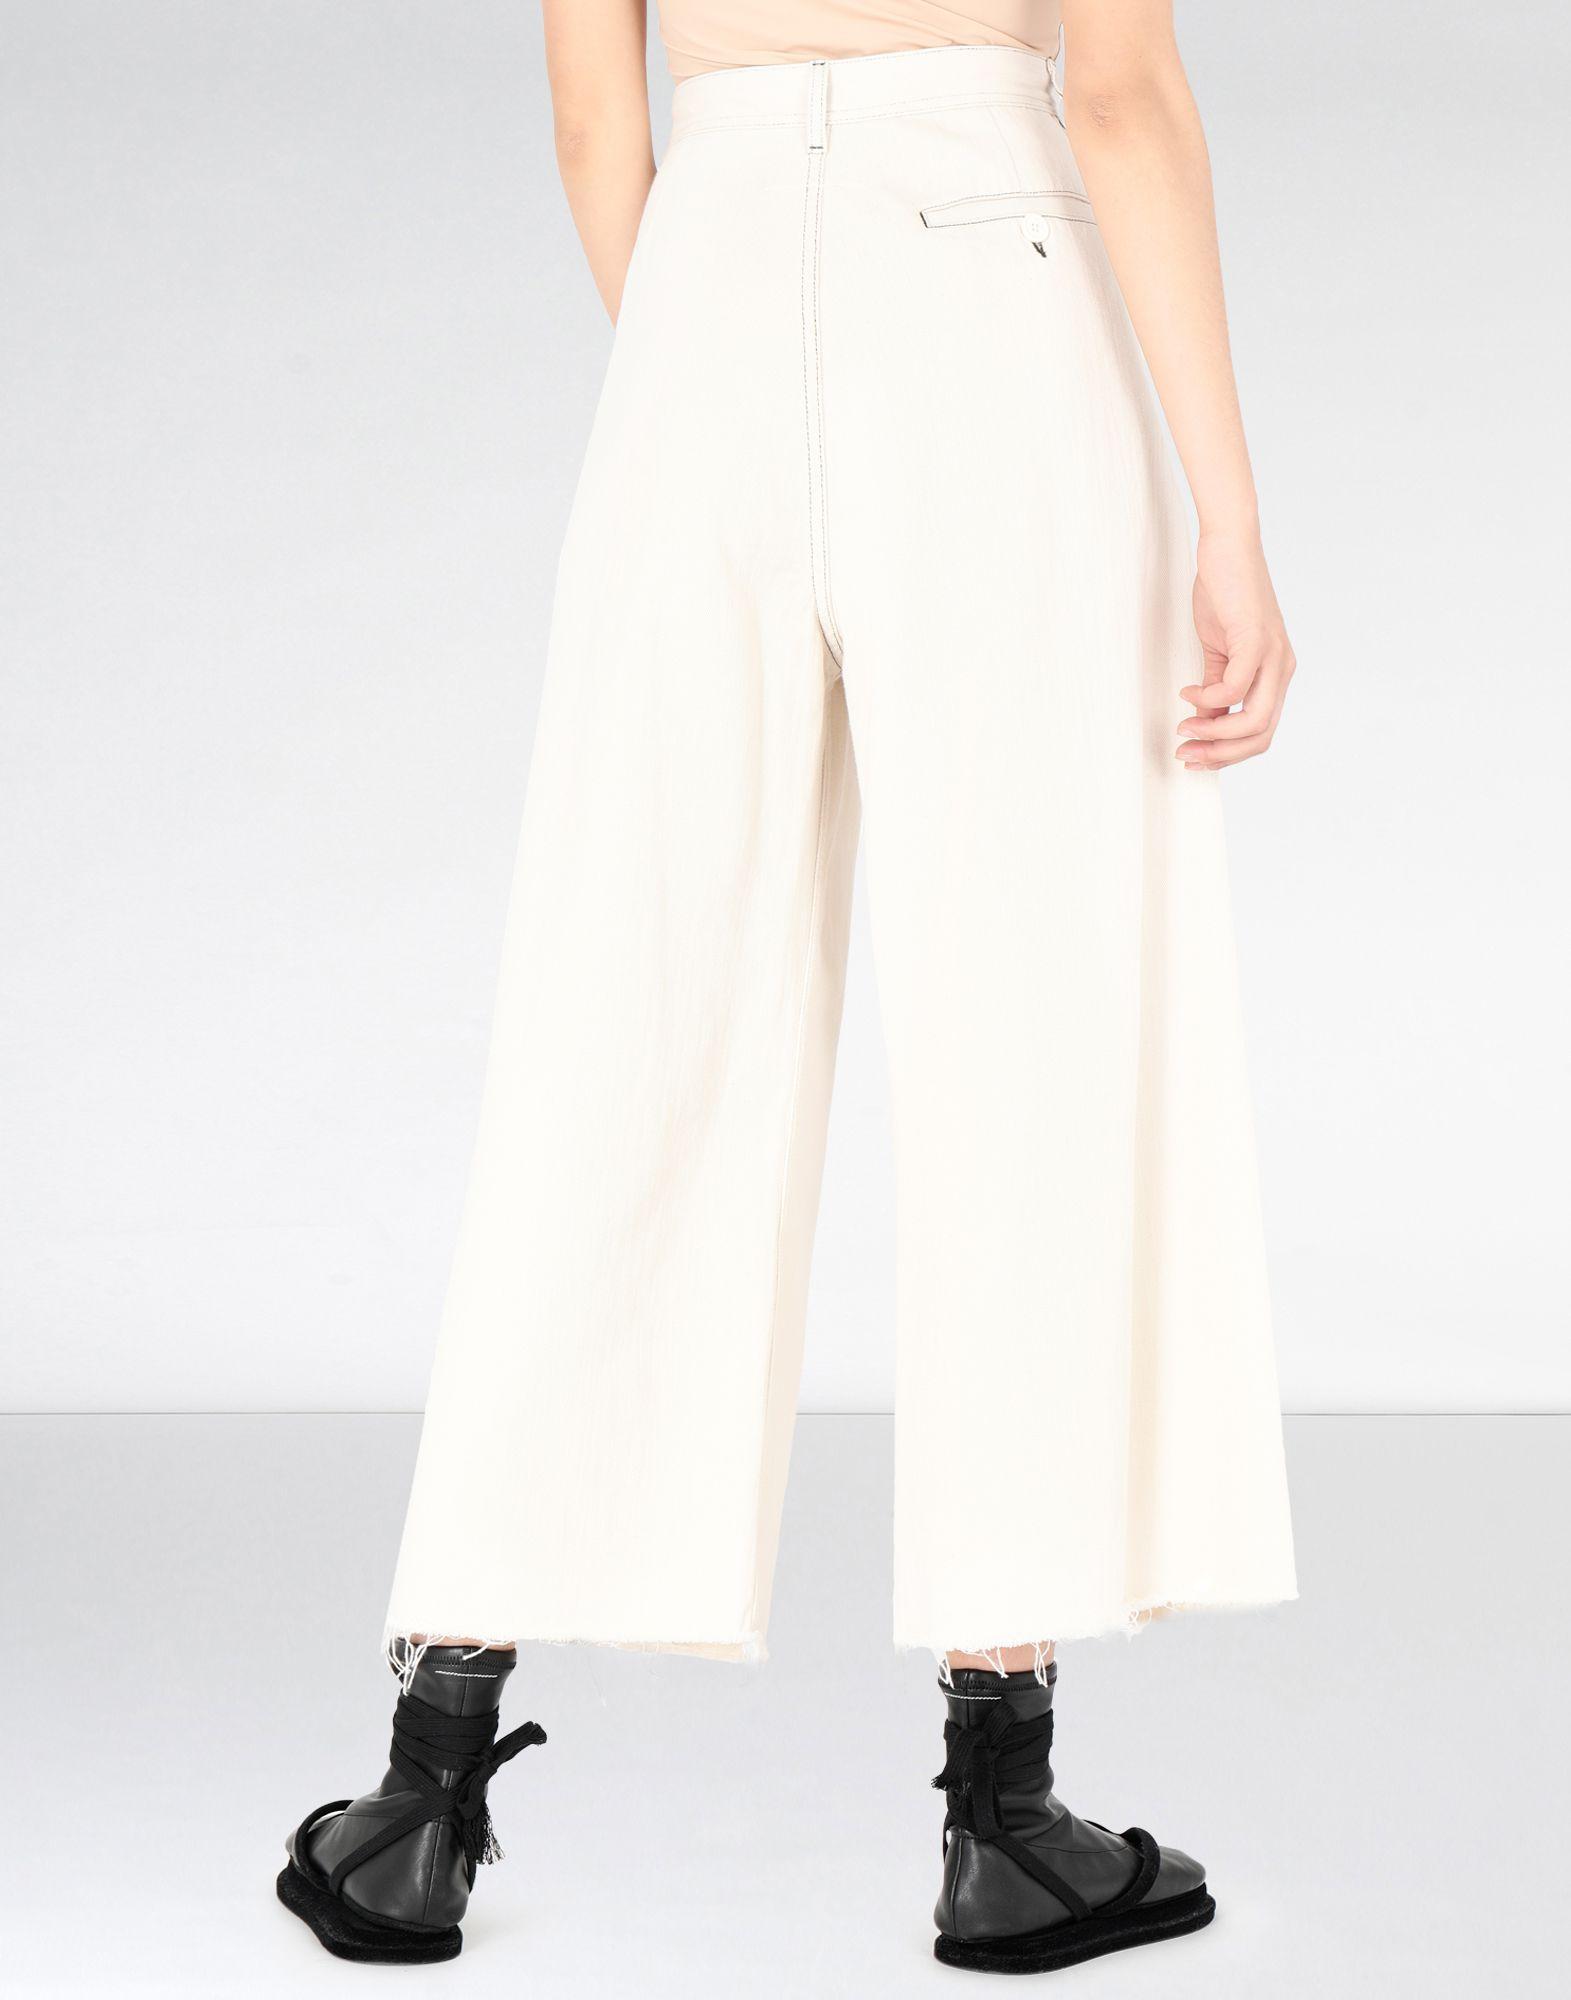 MM6 MAISON MARGIELA Flared cotton trousers Casual pants Woman d